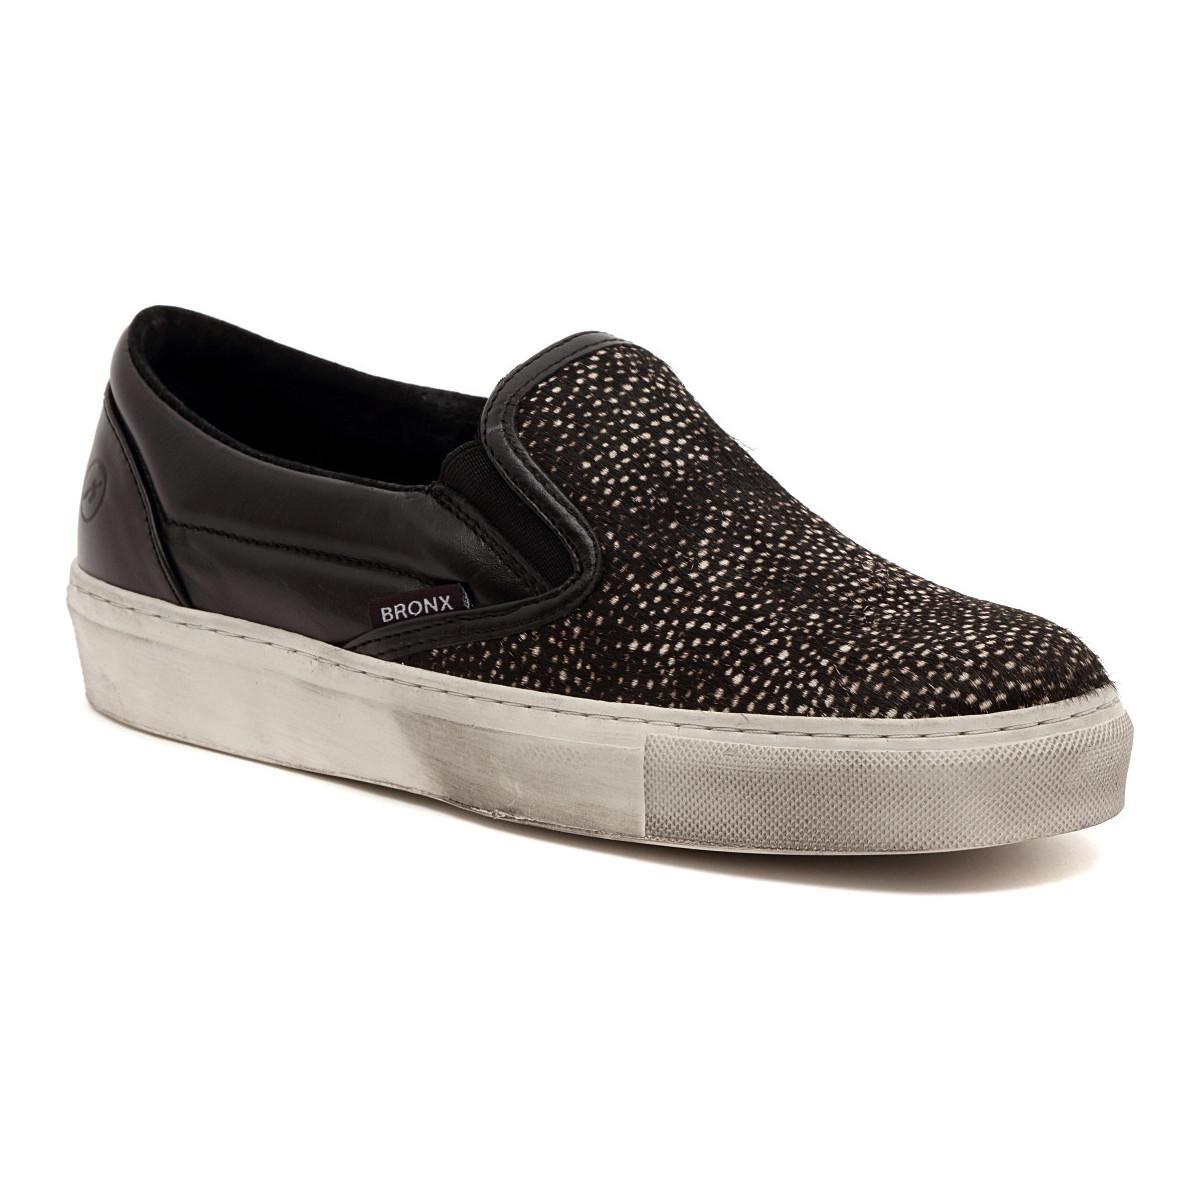 Prada Shoes For Mens Selfridges